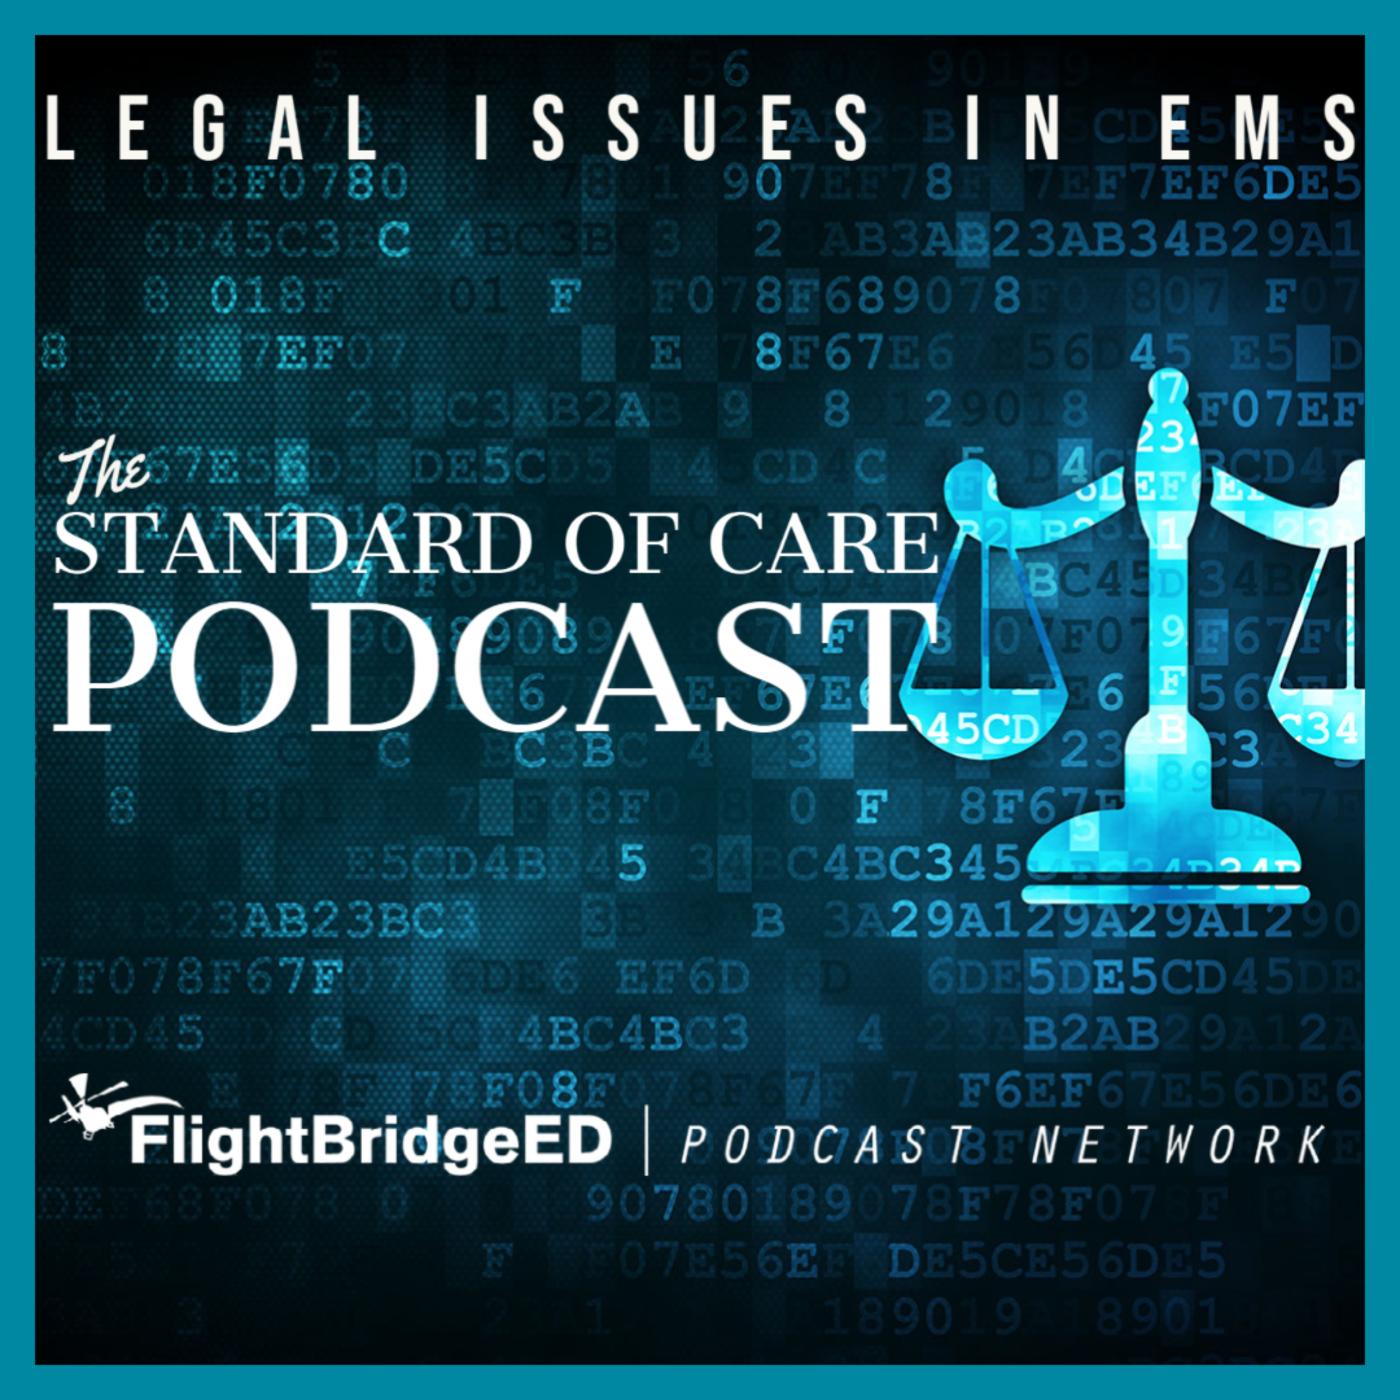 Episode 5: Vitamin K (Legally!)